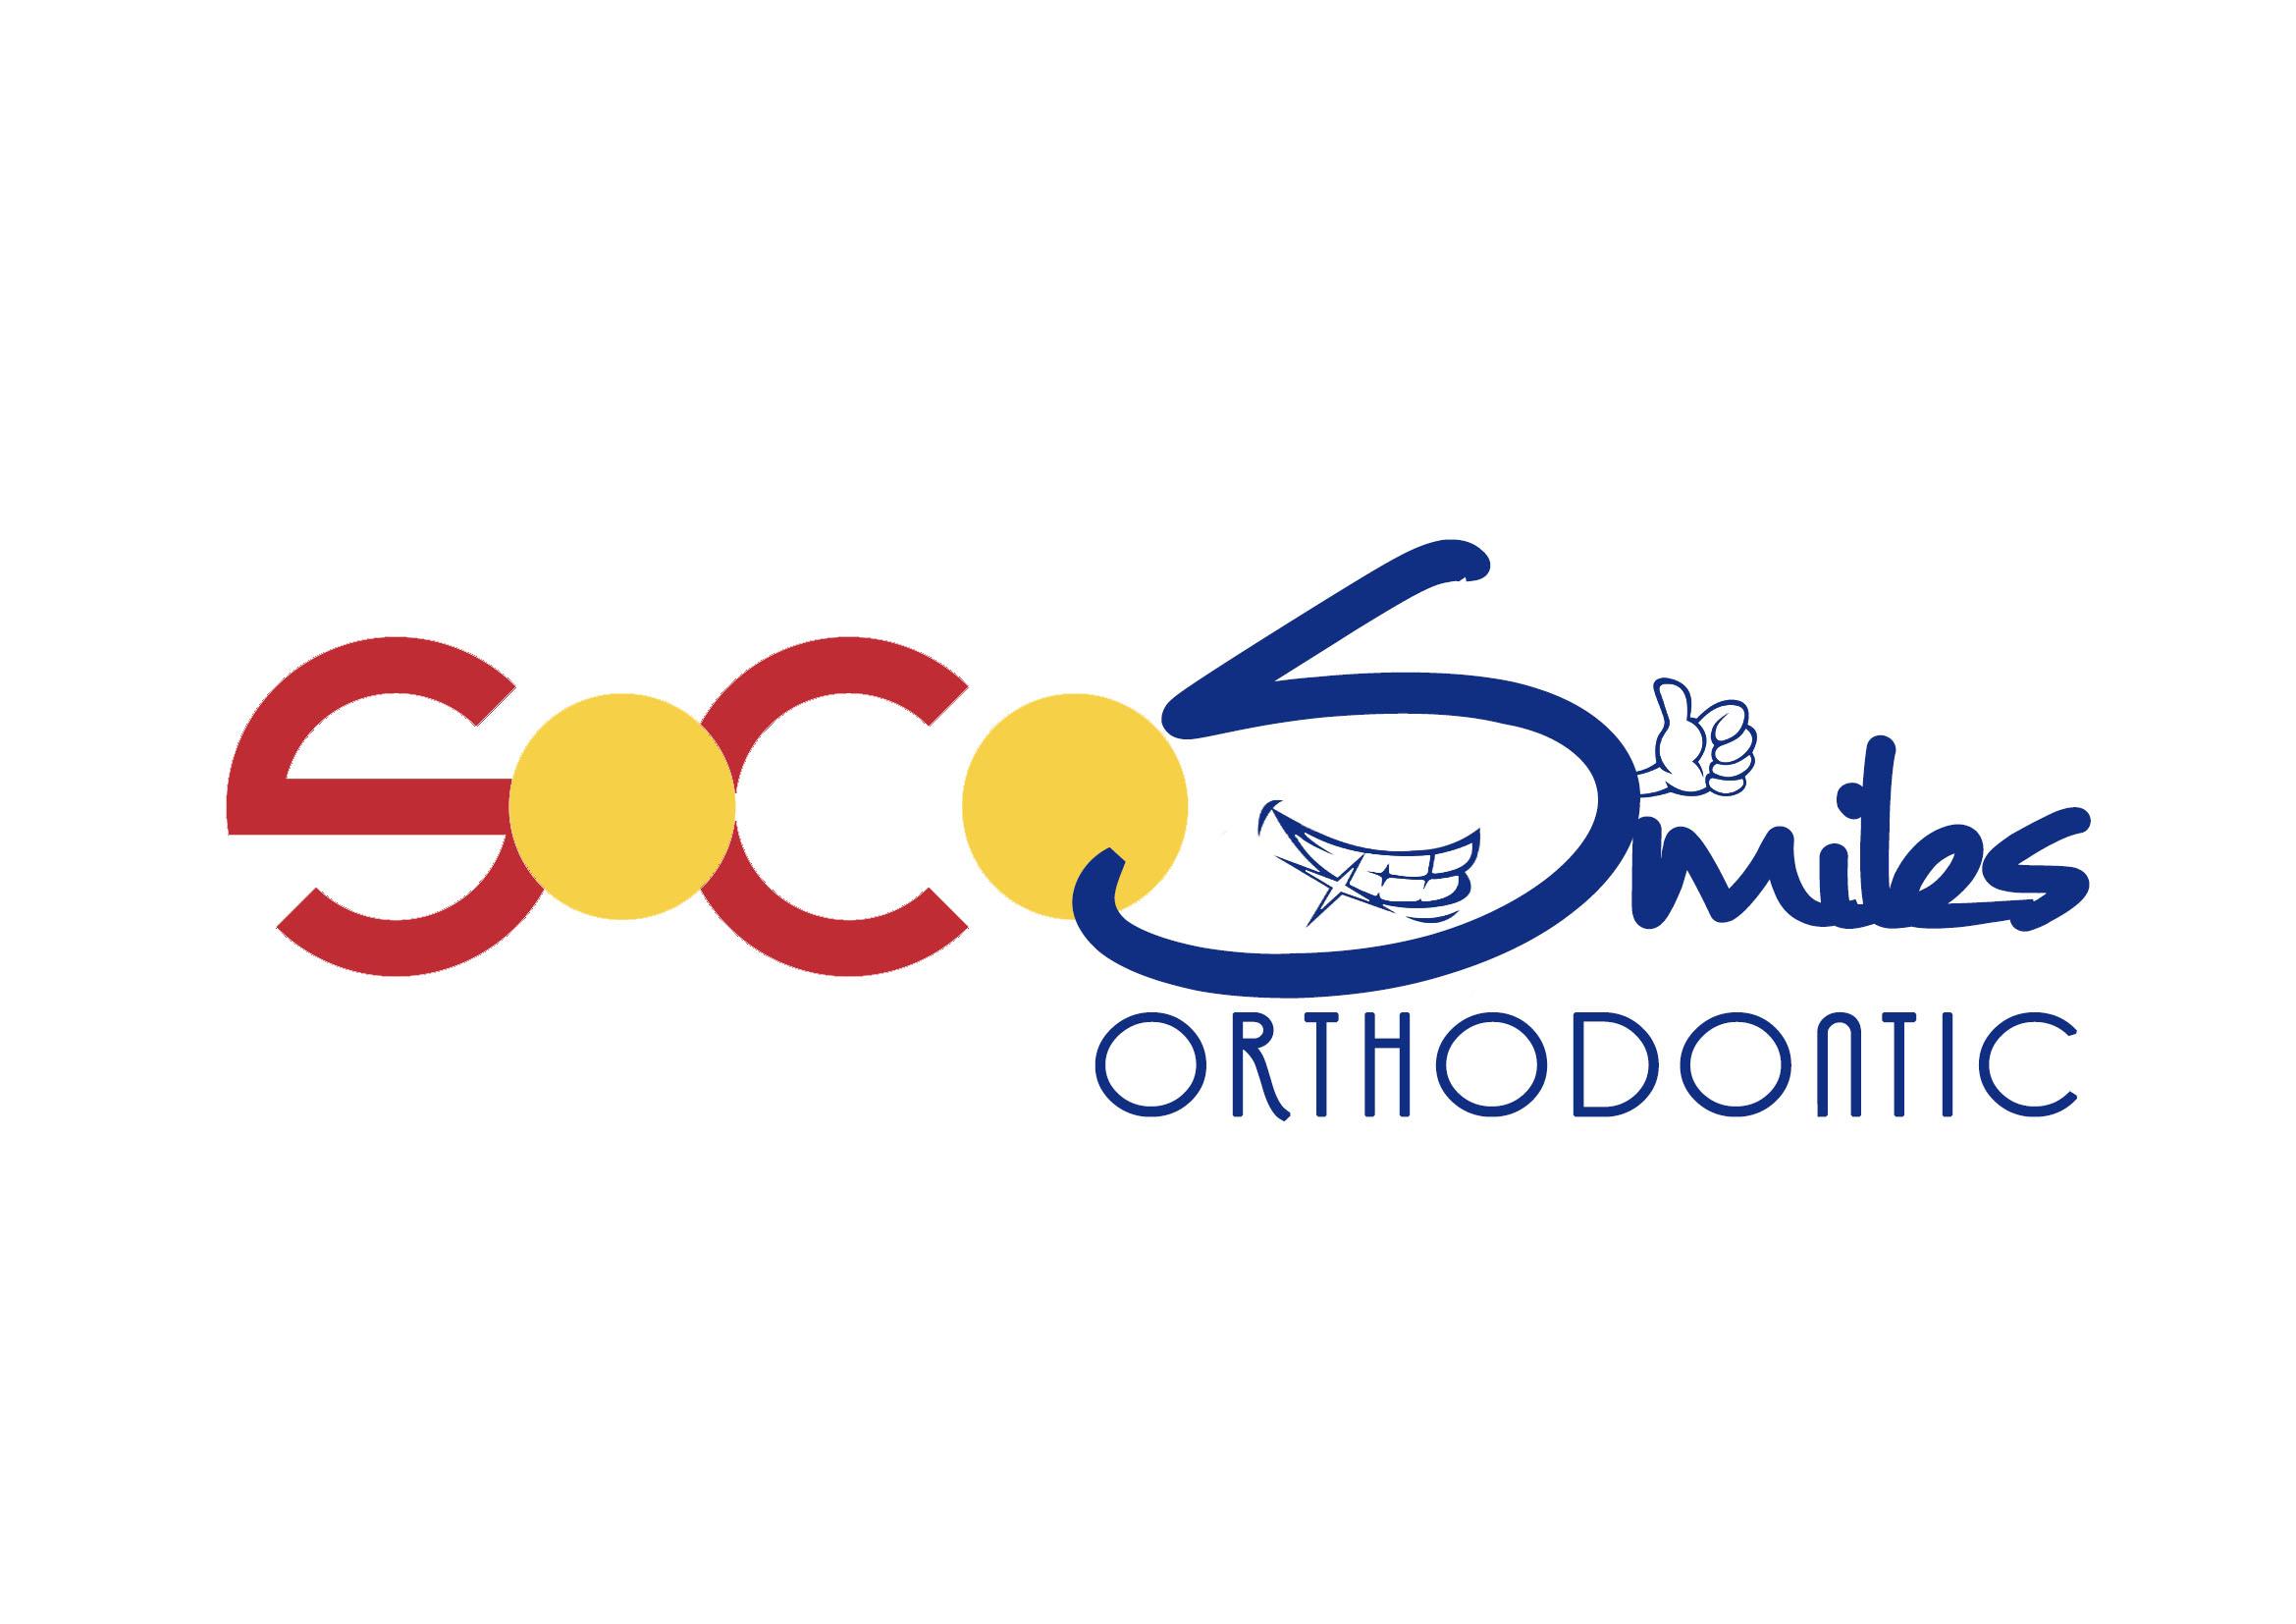 Logo Design by JR Cantos - Entry No. 21 in the Logo Design Contest Unique Logo Design Wanted for SoCO Smiles Orthodontics.